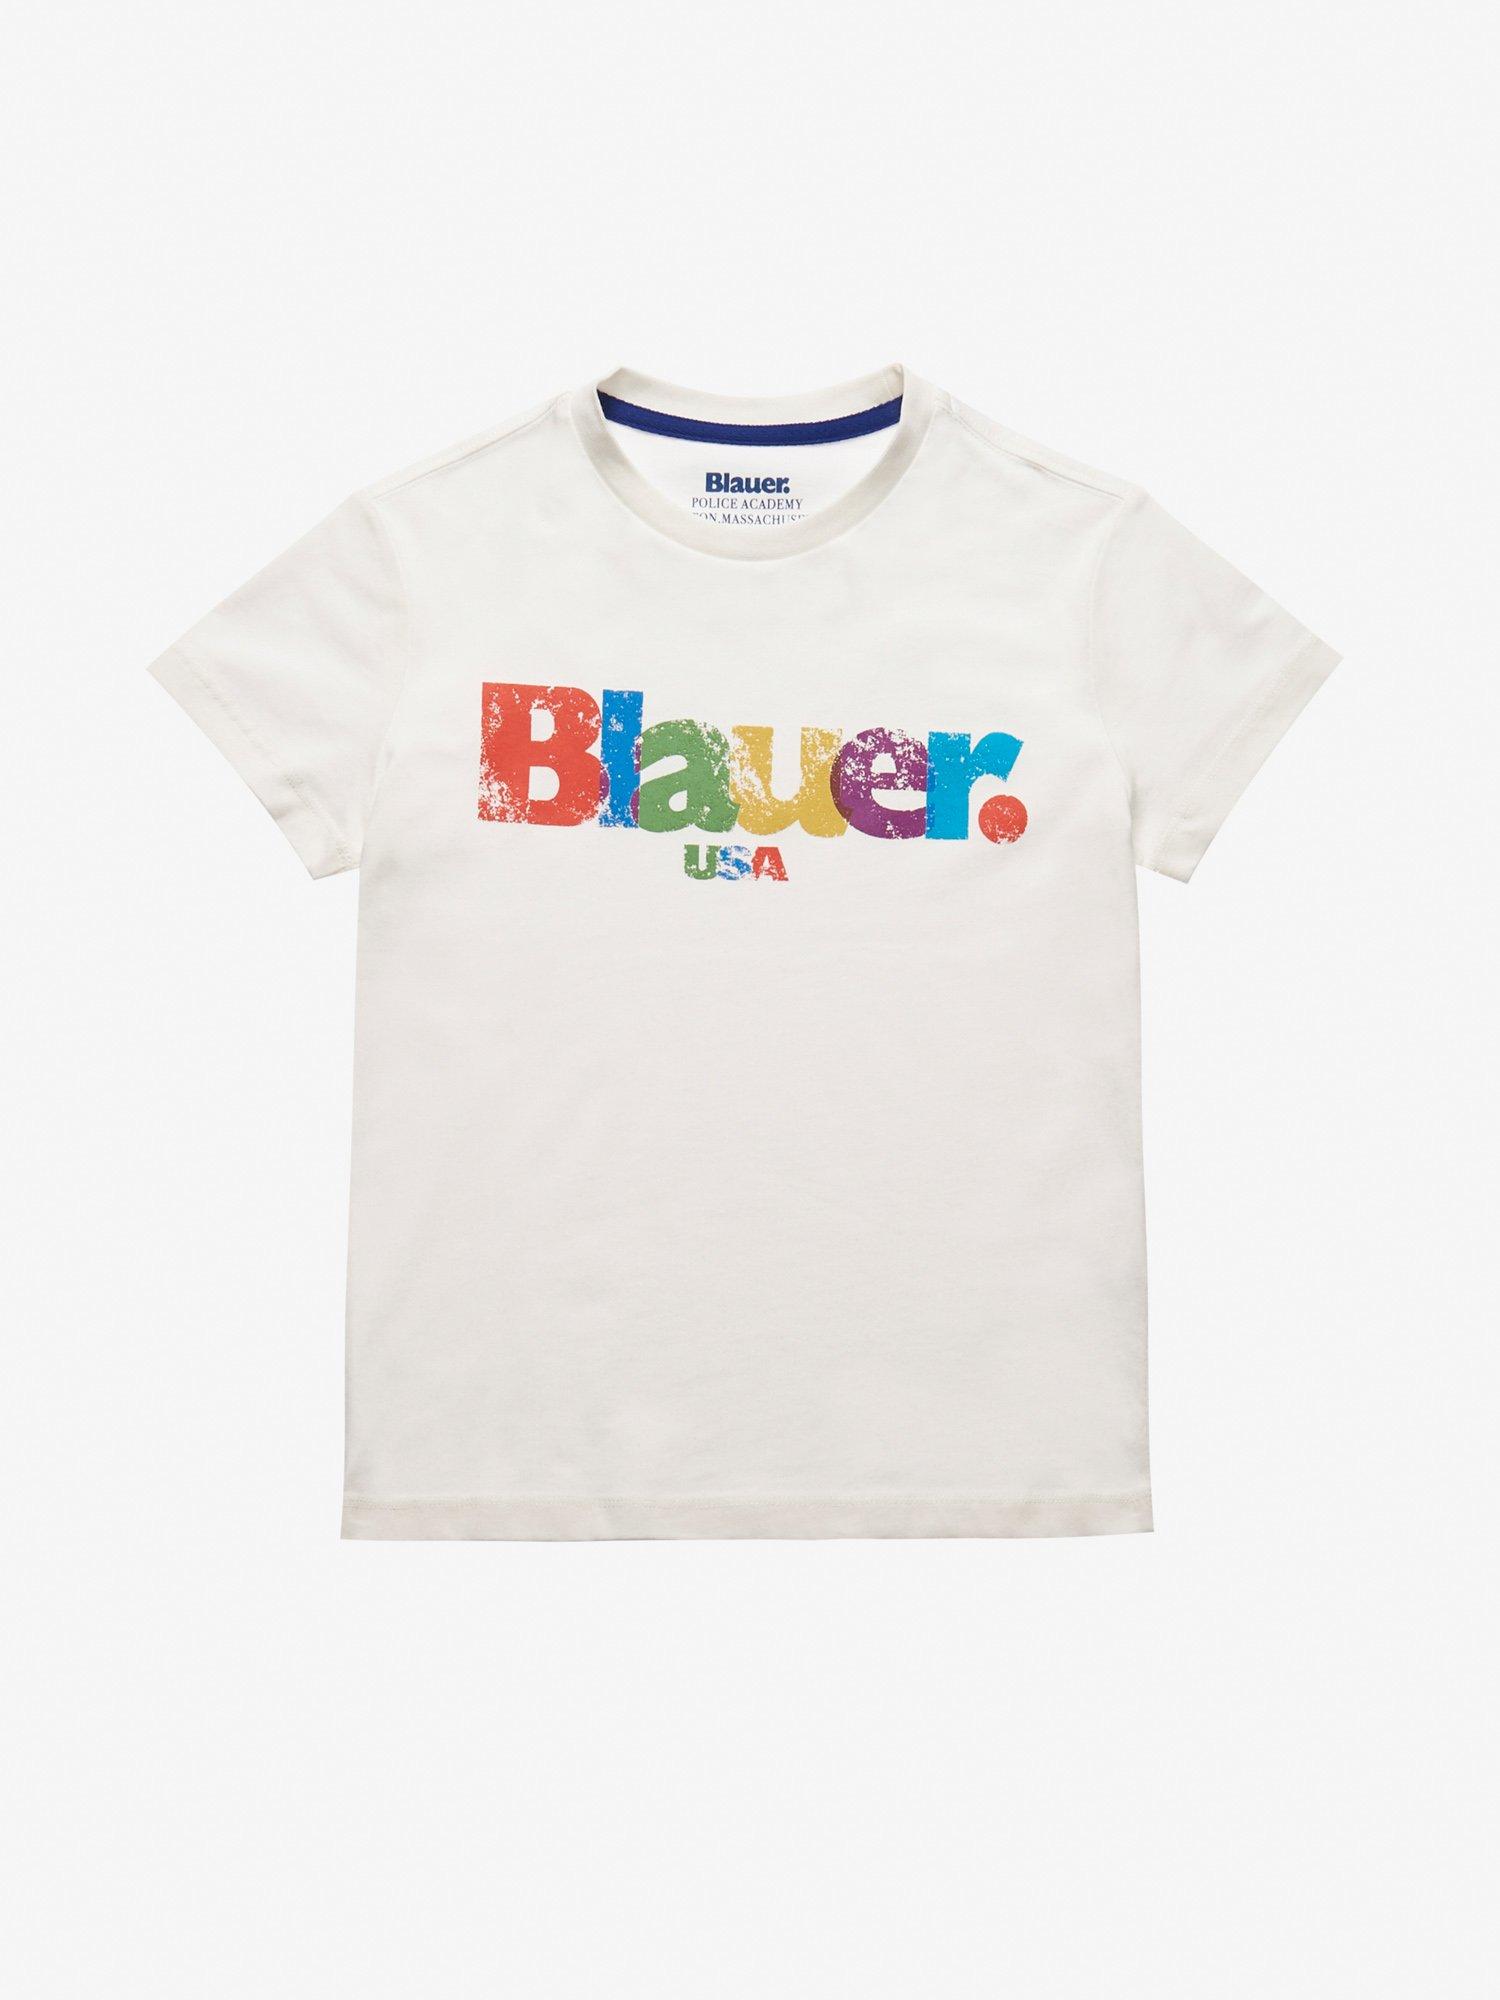 JUNIOR MULTICOLOR BLAUER T-SHIRT - Blauer